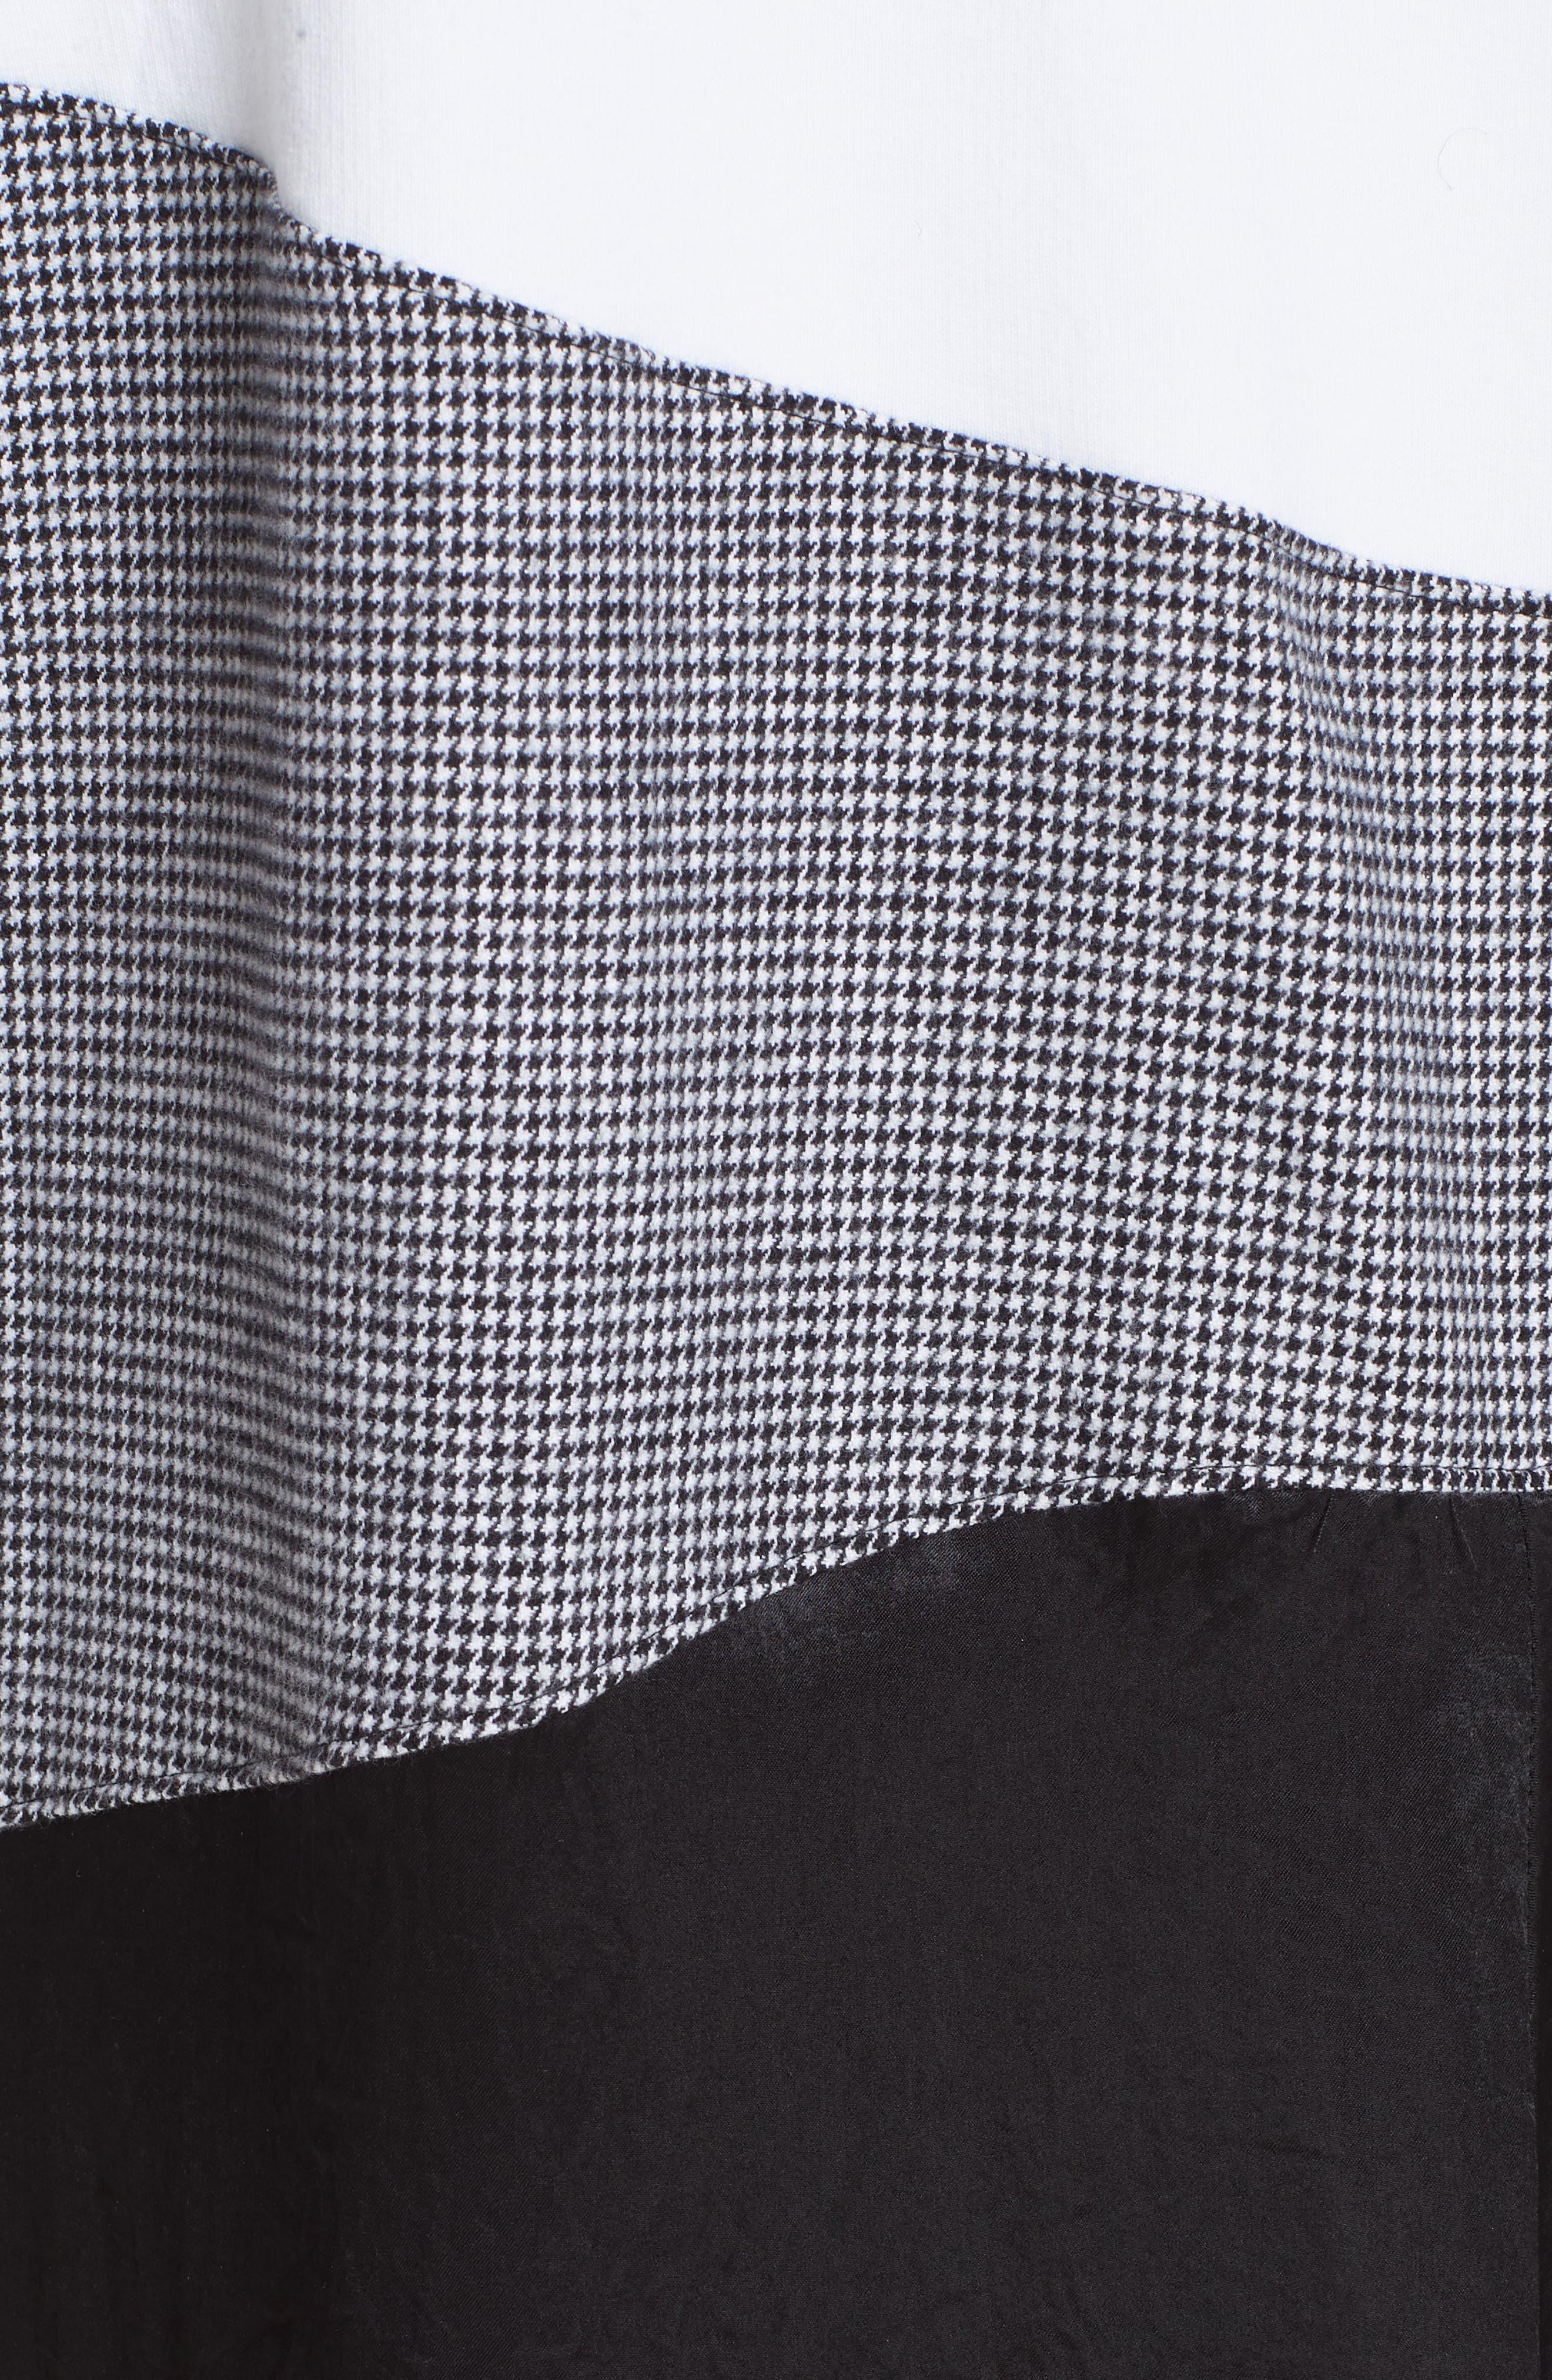 Colorblock Asymmetric Dress,                             Alternate thumbnail 6, color,                             WHITE/ BLACK